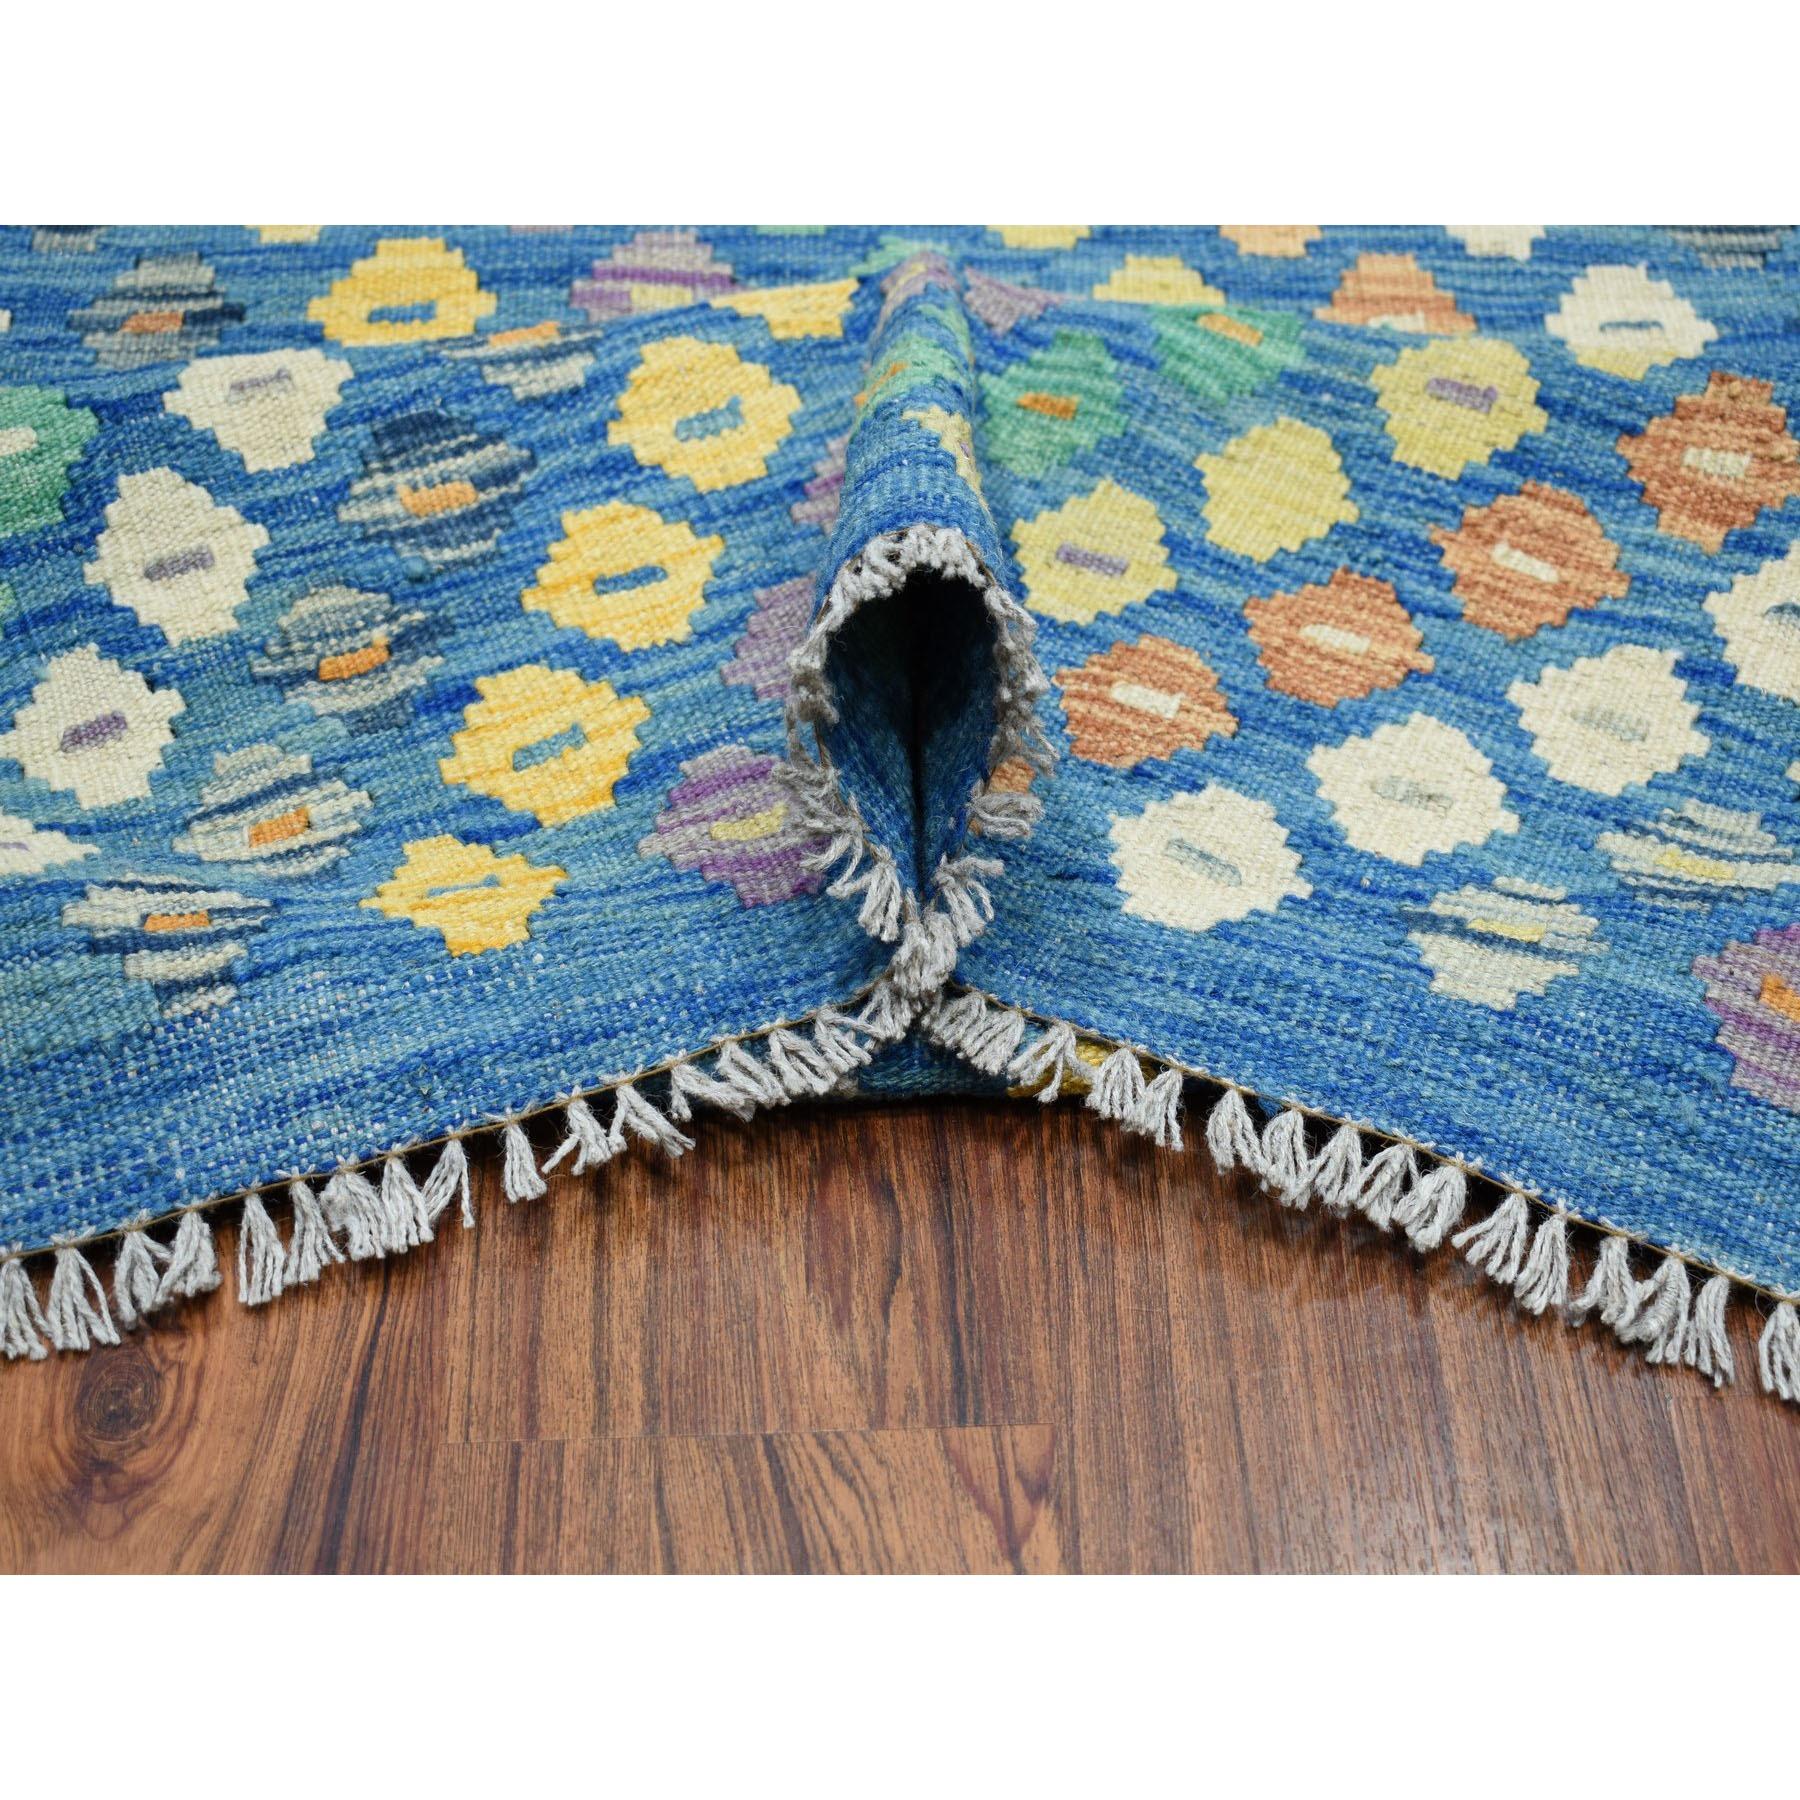 8-8 x11-6  Hand Woven Colorful Afghan Kilim Pure Wool Oriental Rug